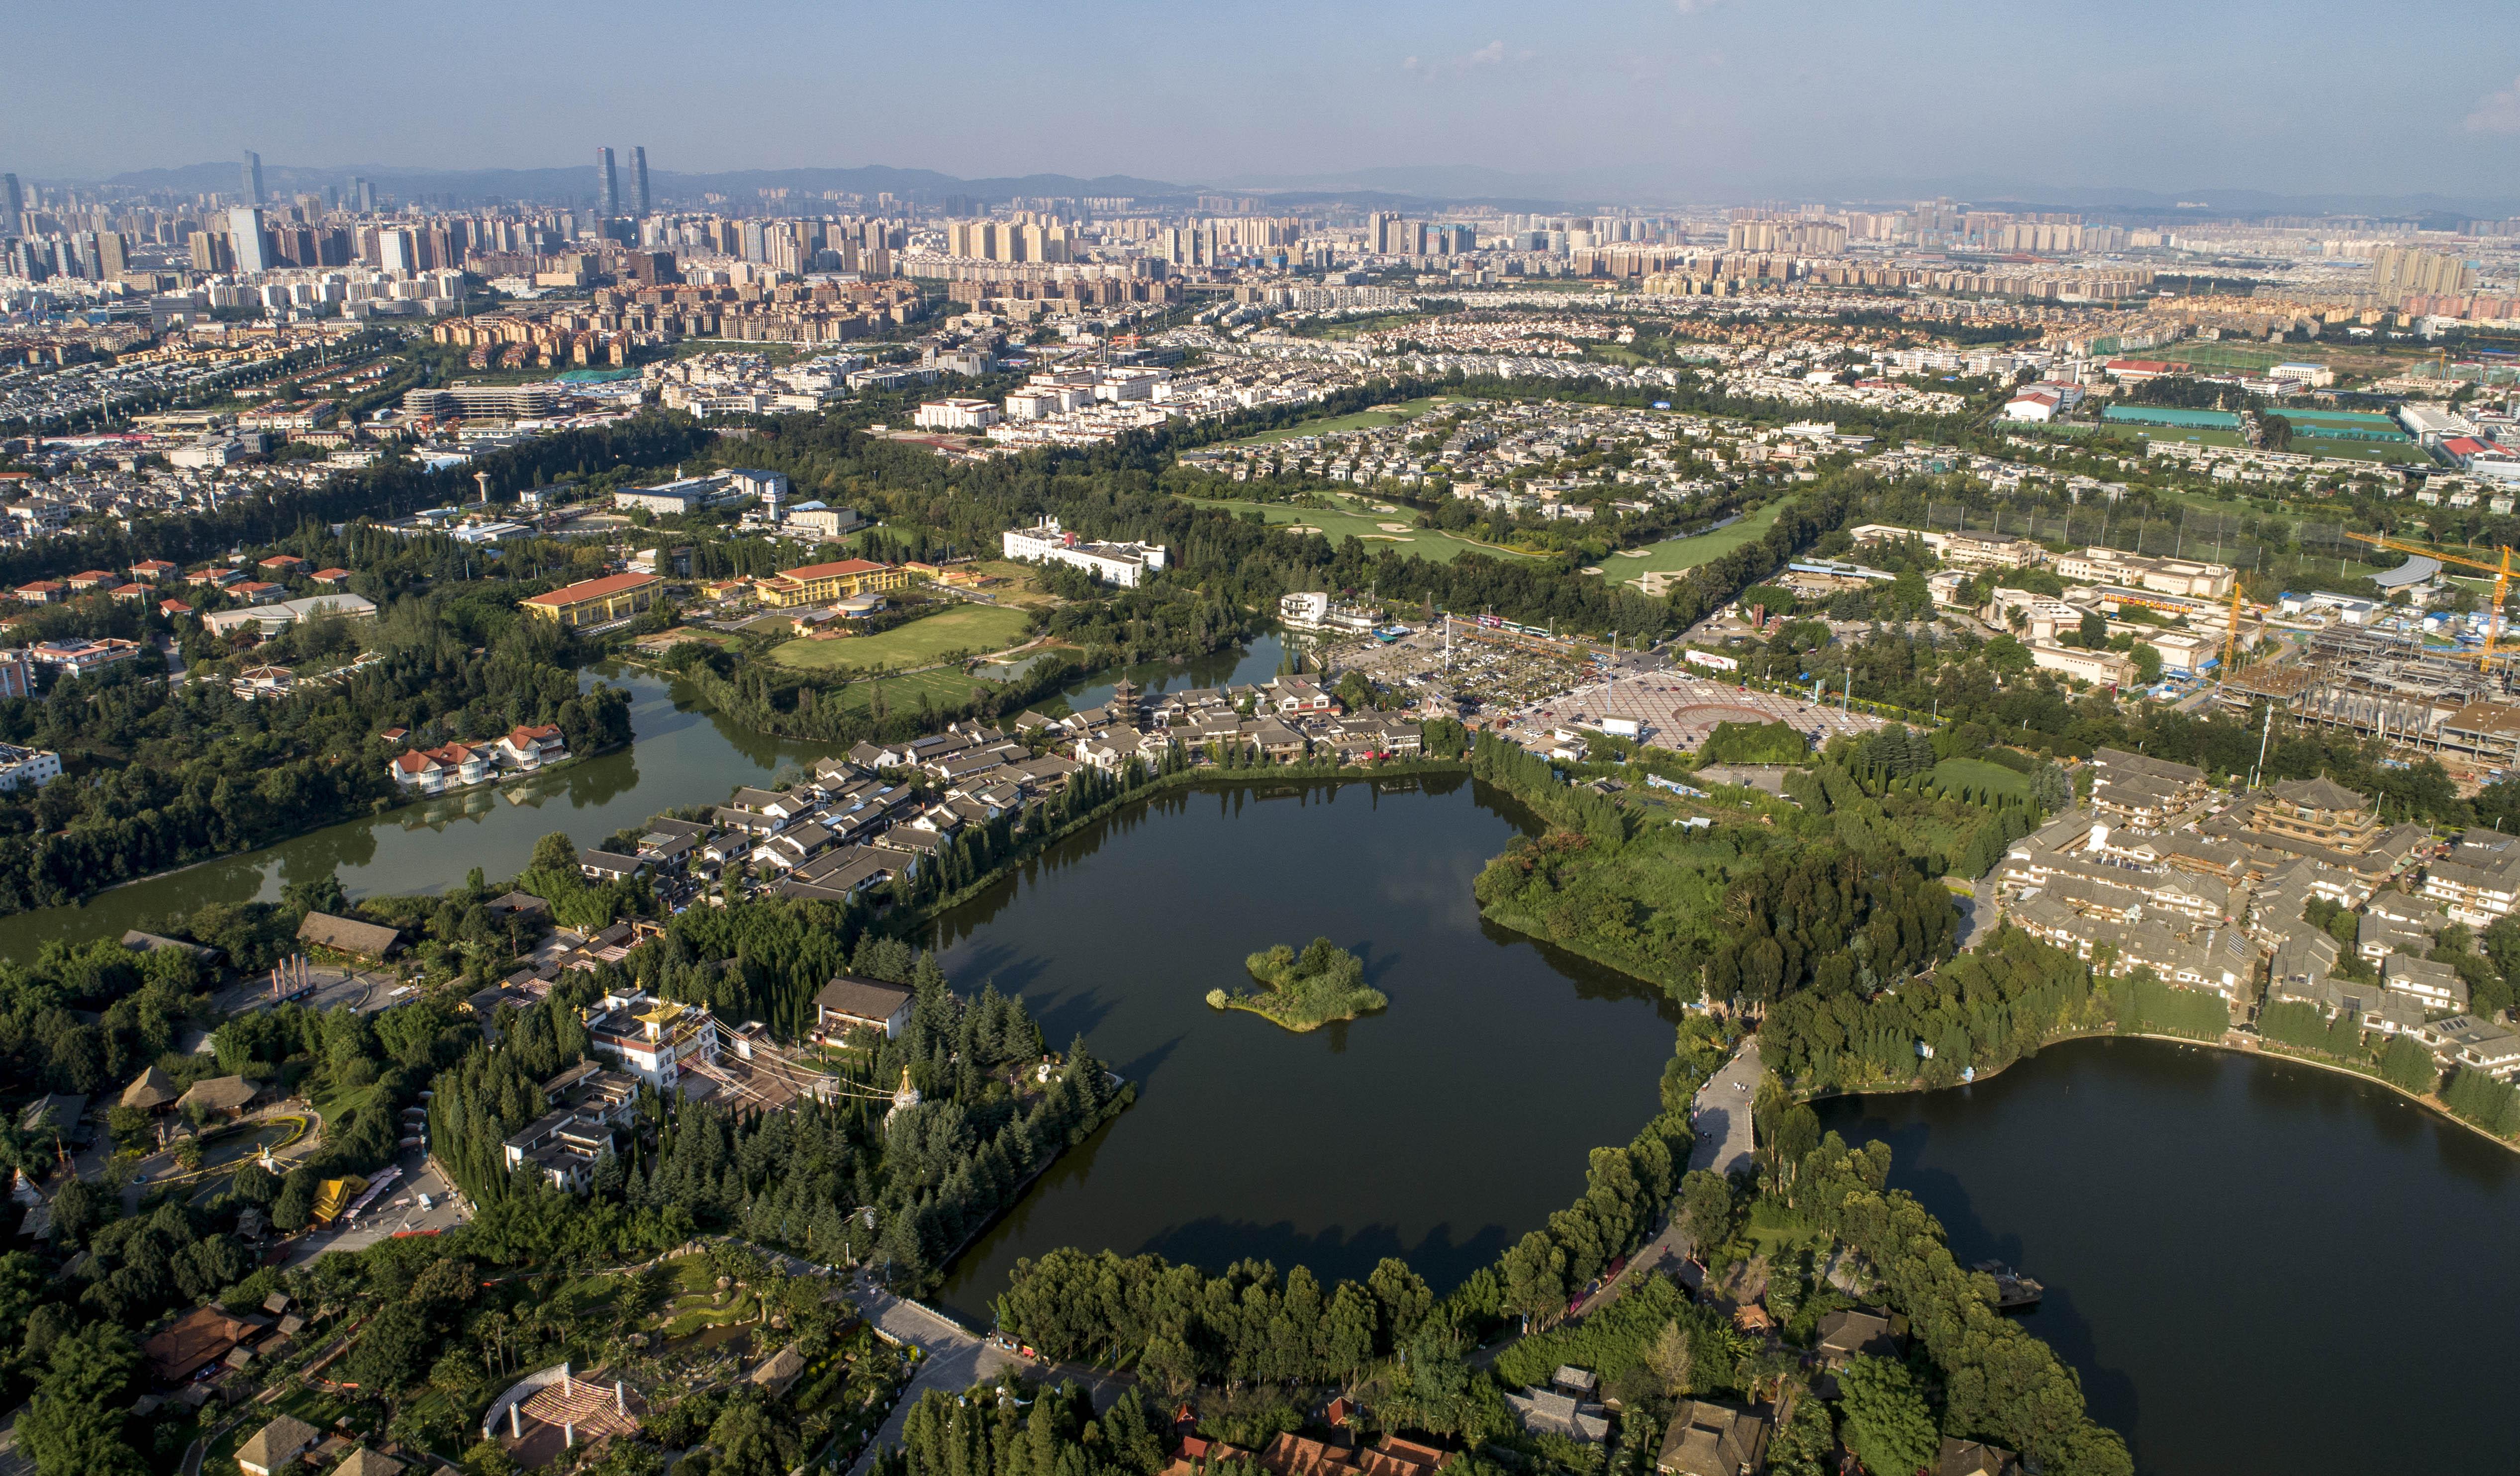 Lancang-Mekong Cooperation Expo to be held in SW China - Xinhua | English.news.cn